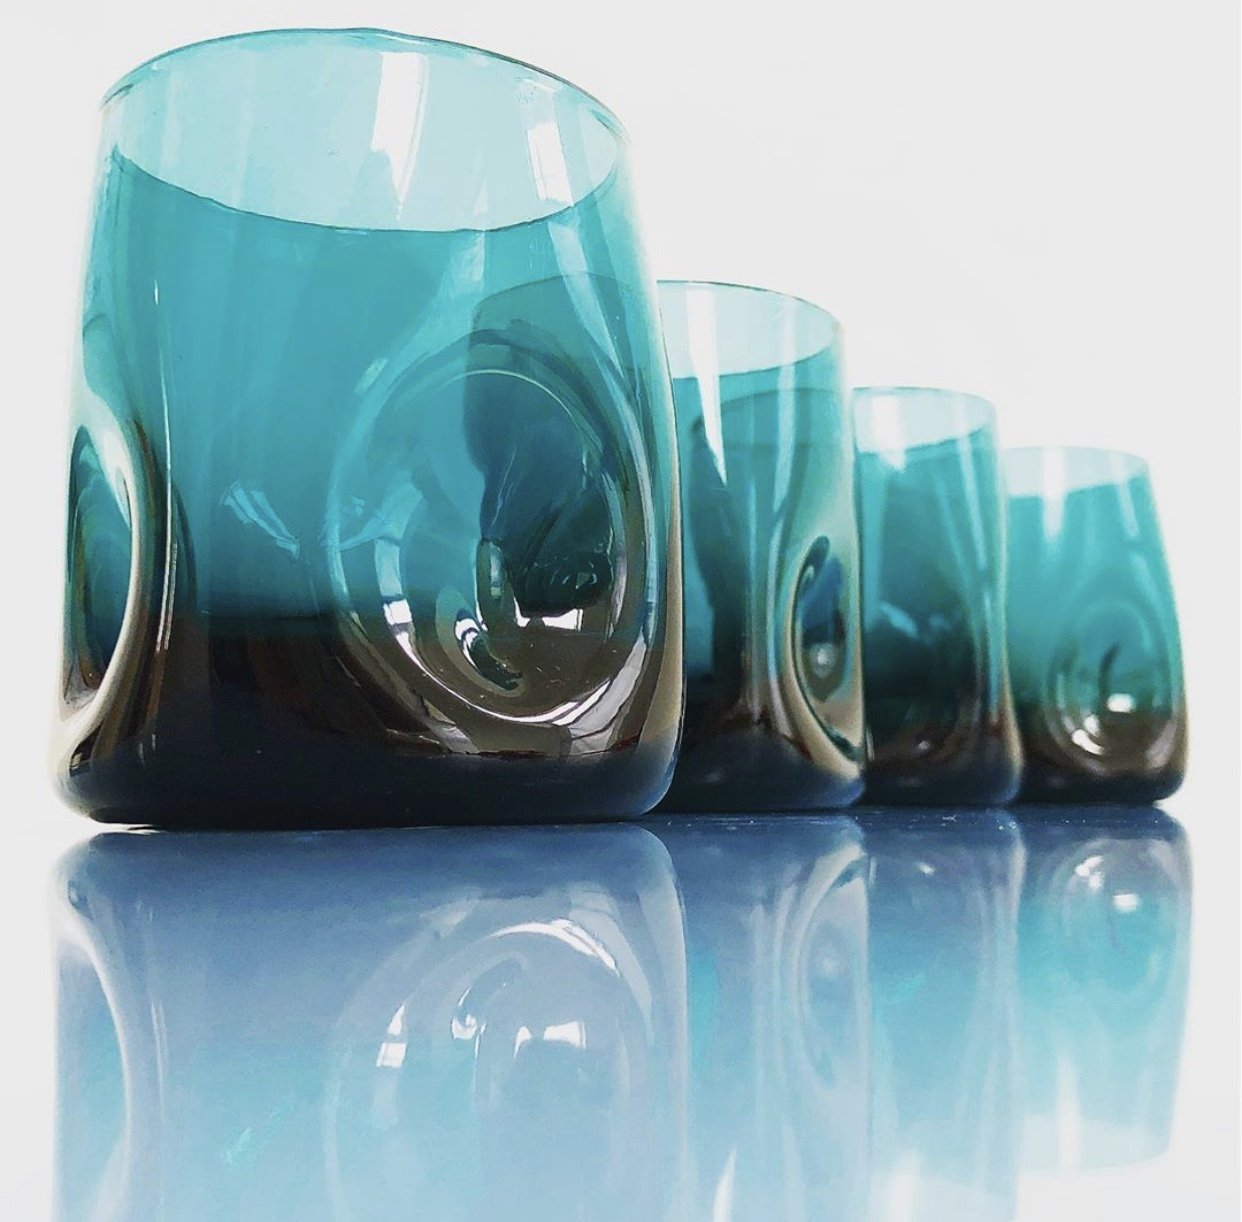 glassware vintage christmas gift ideas for him shot glasses